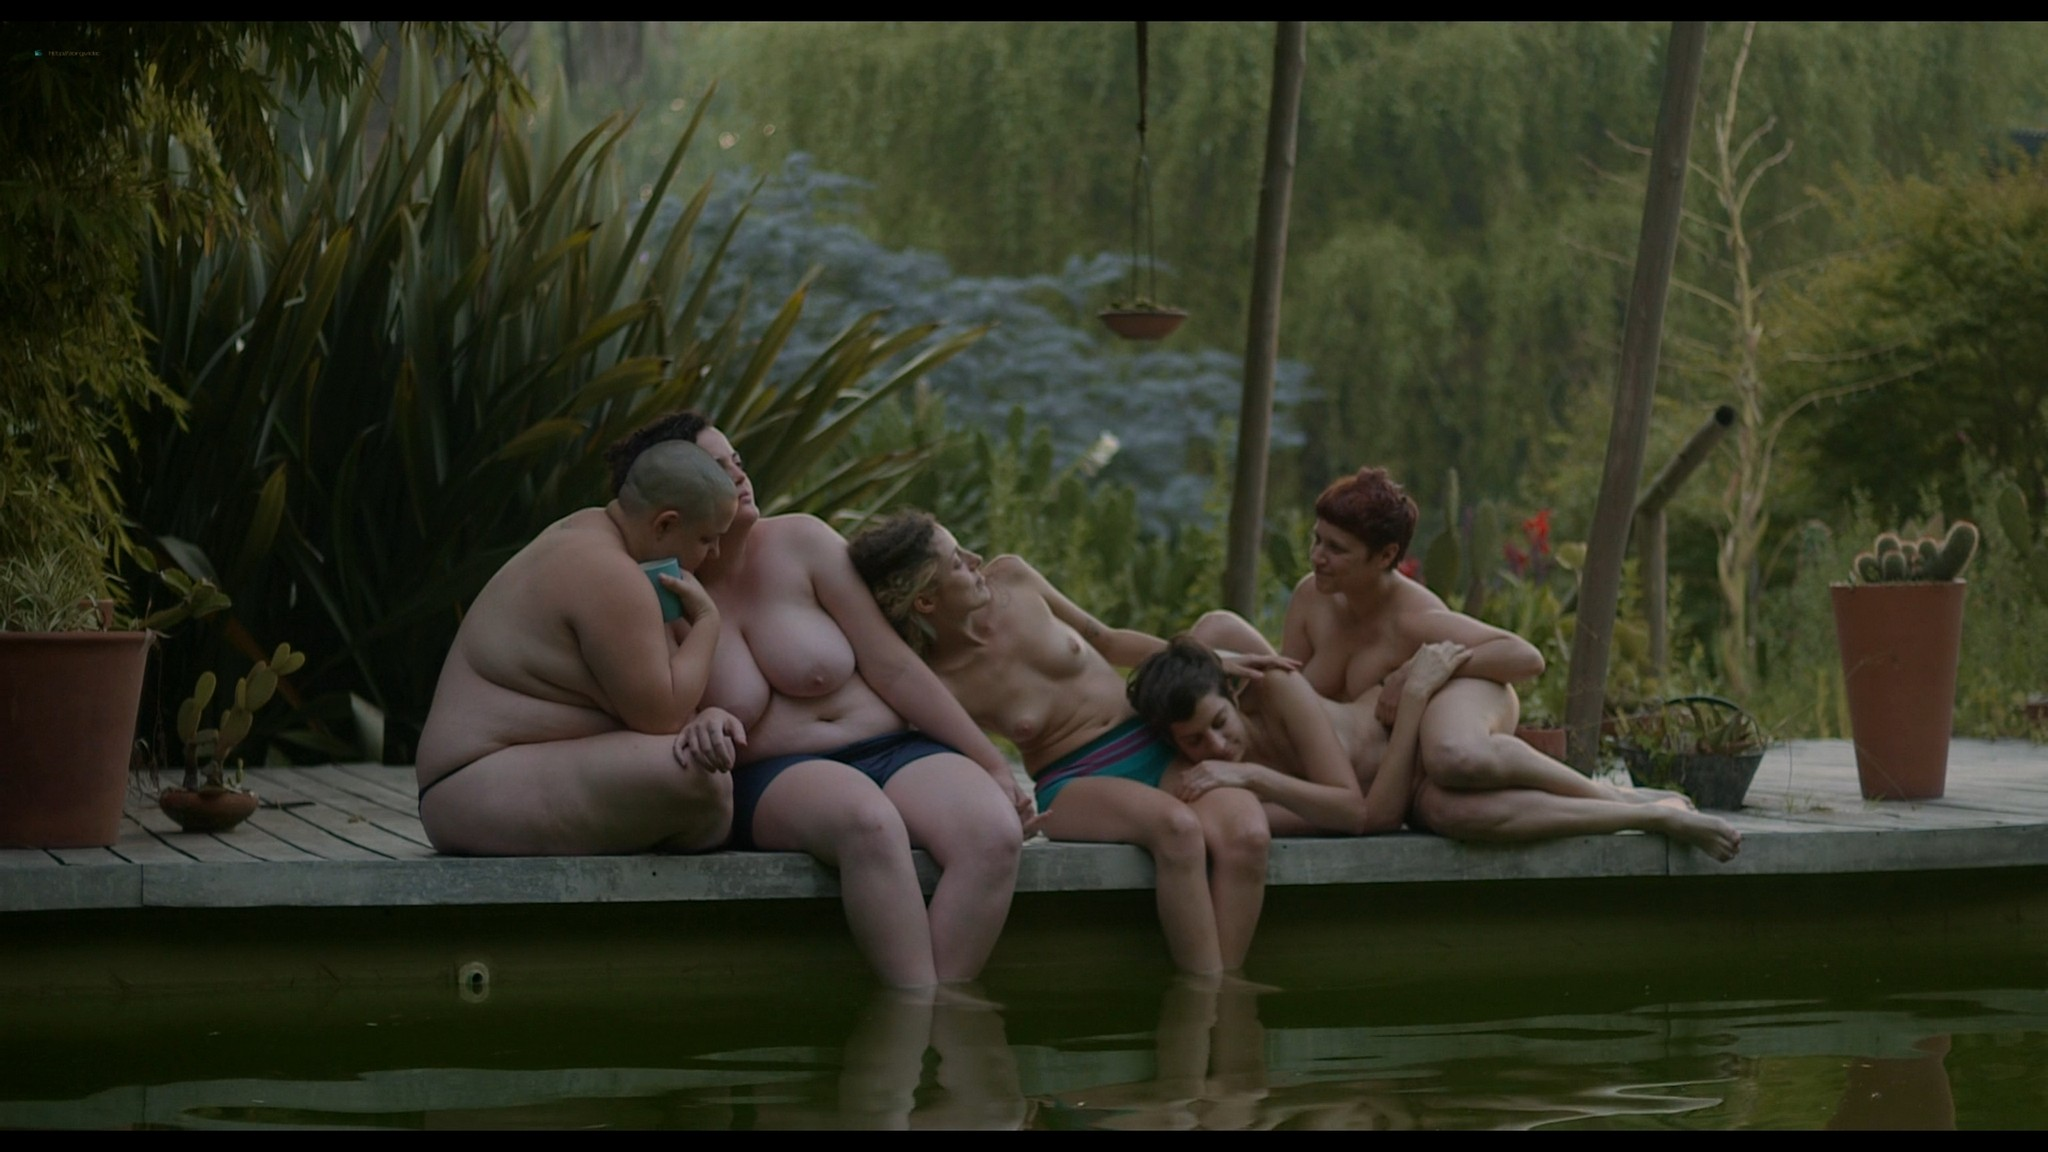 Sofia Gala Castiglione nude explicit Erica Rivas and others nude explicit lesbian sex The Daughters of Fire 2018 1080p Web 12